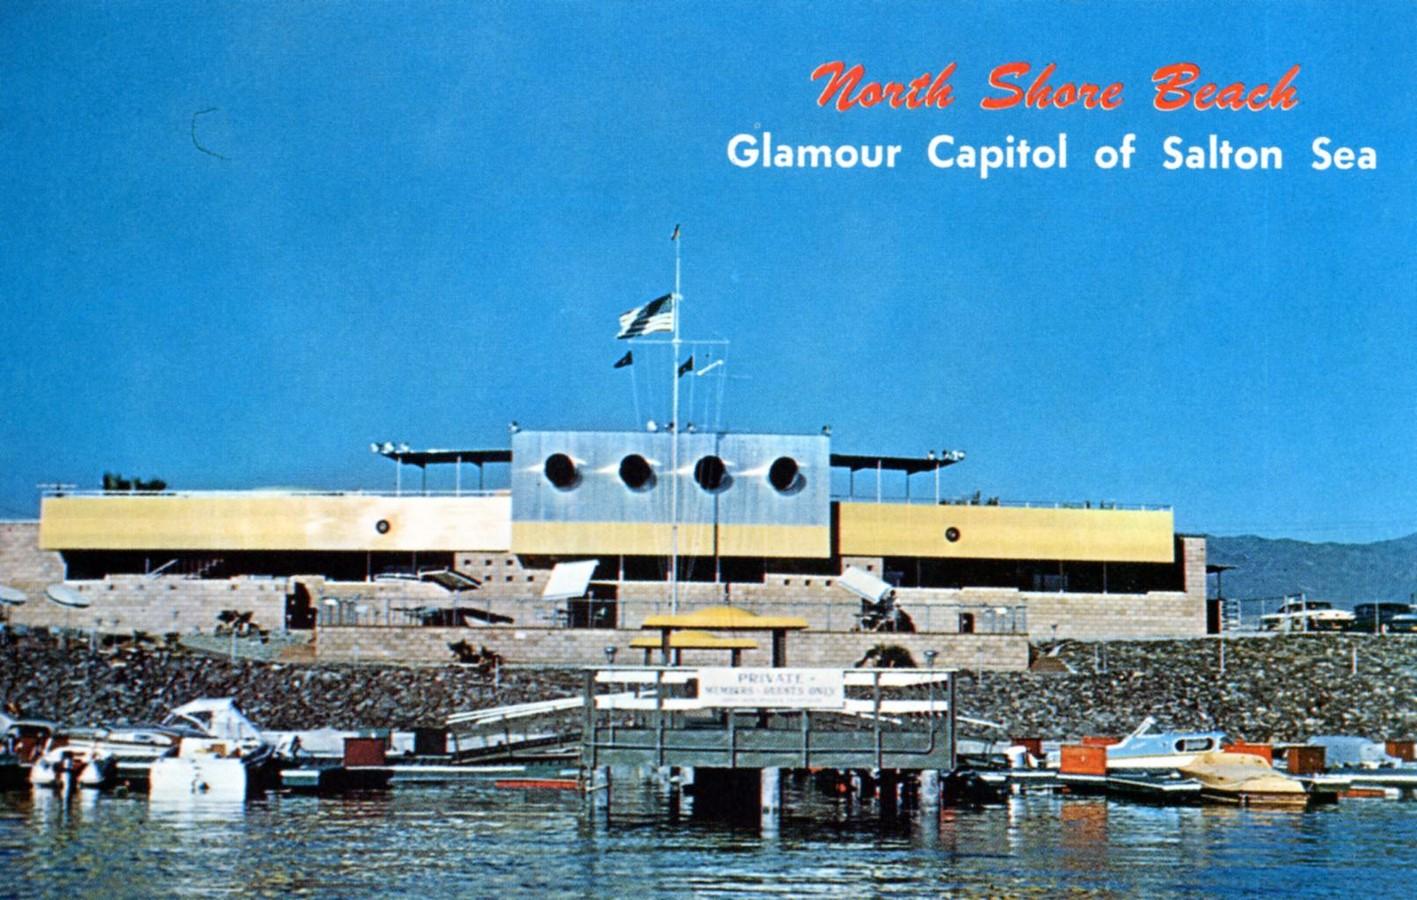 NORTH SHORE BEACH AND YACHT CLUB - Sheet1